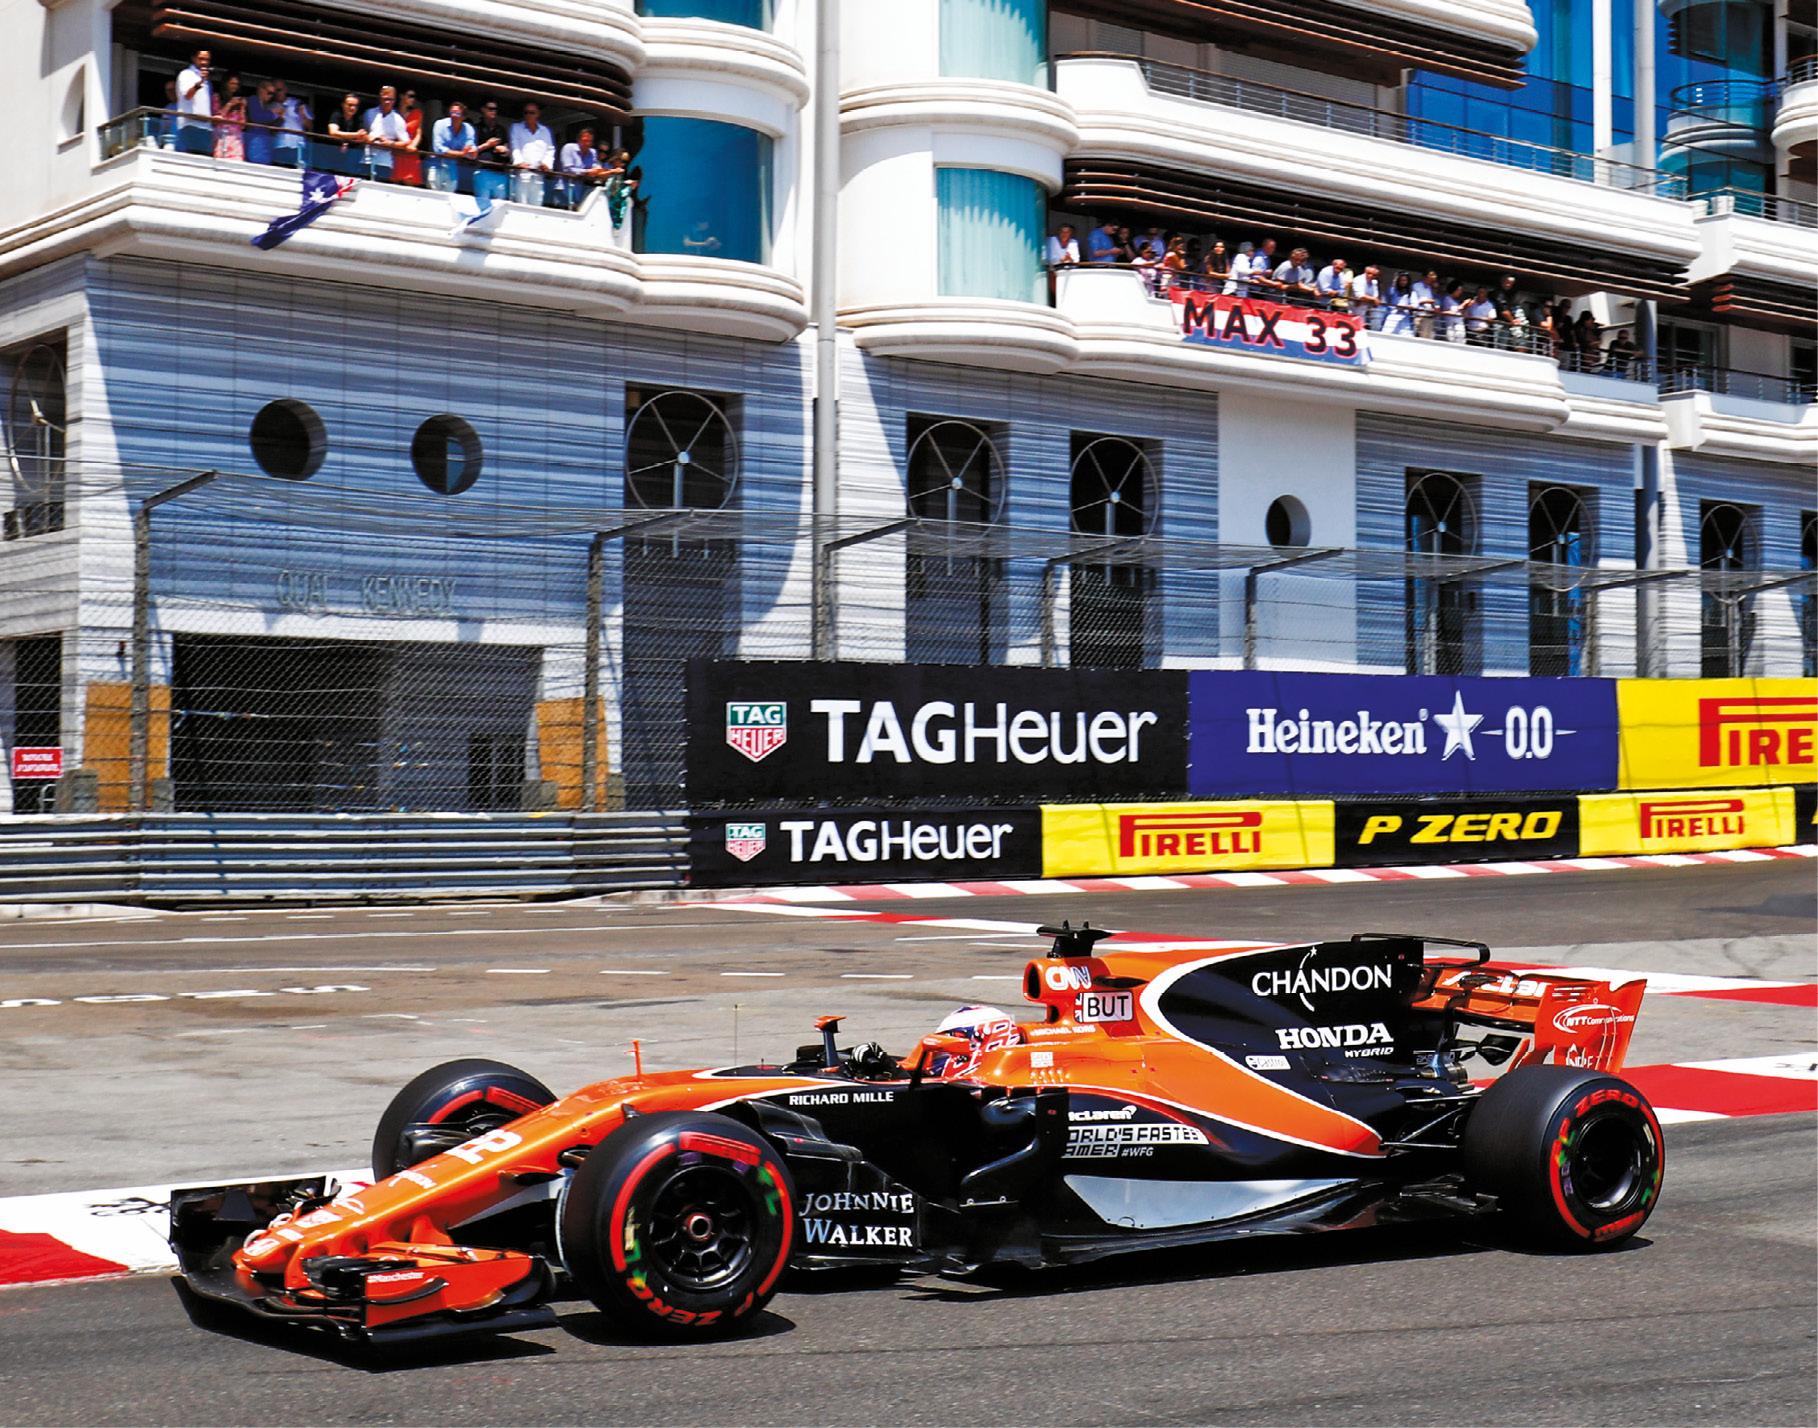 That Monaco comeback in 2017 took some self-persuasion